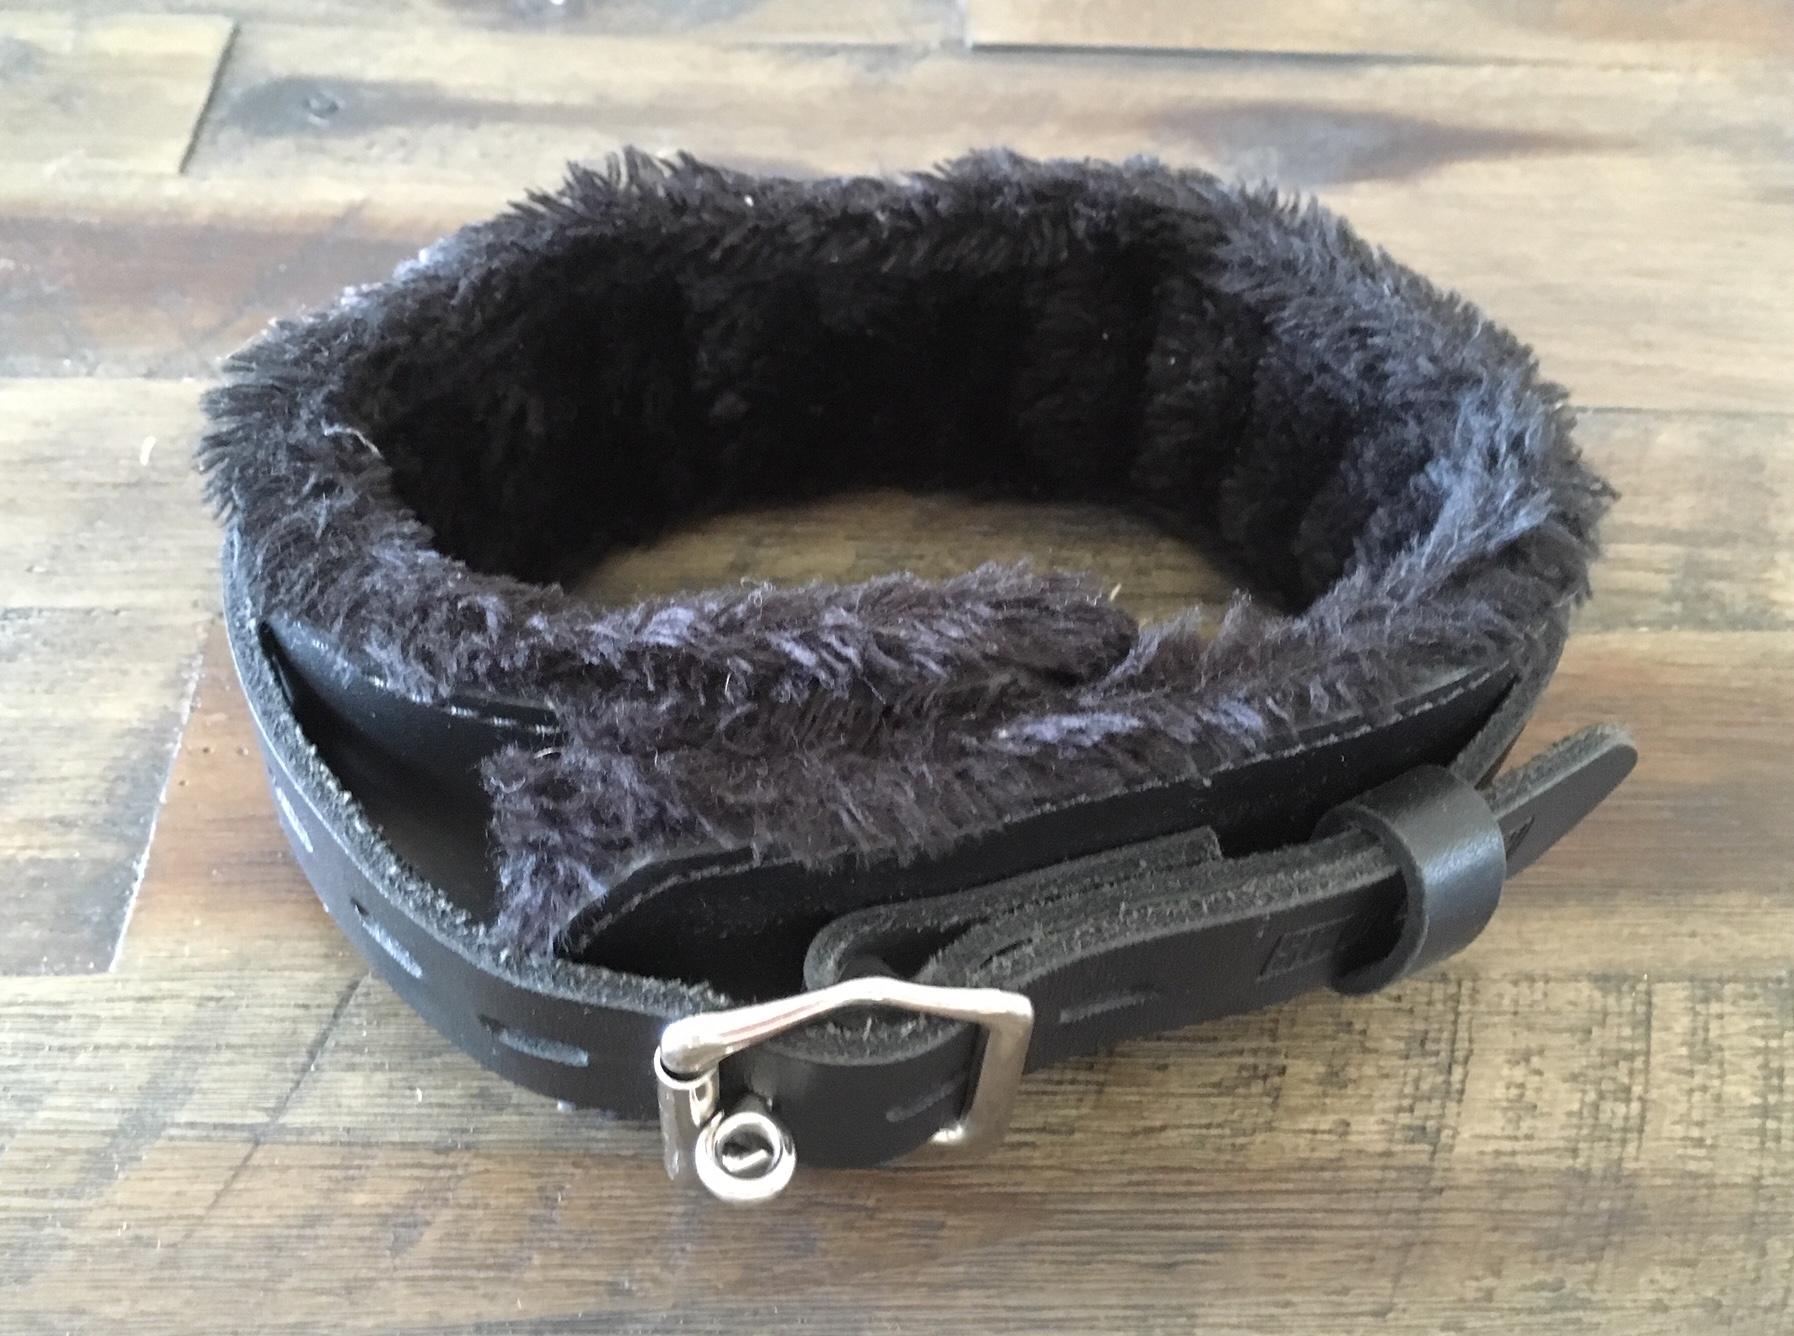 Black Leather Collar Image